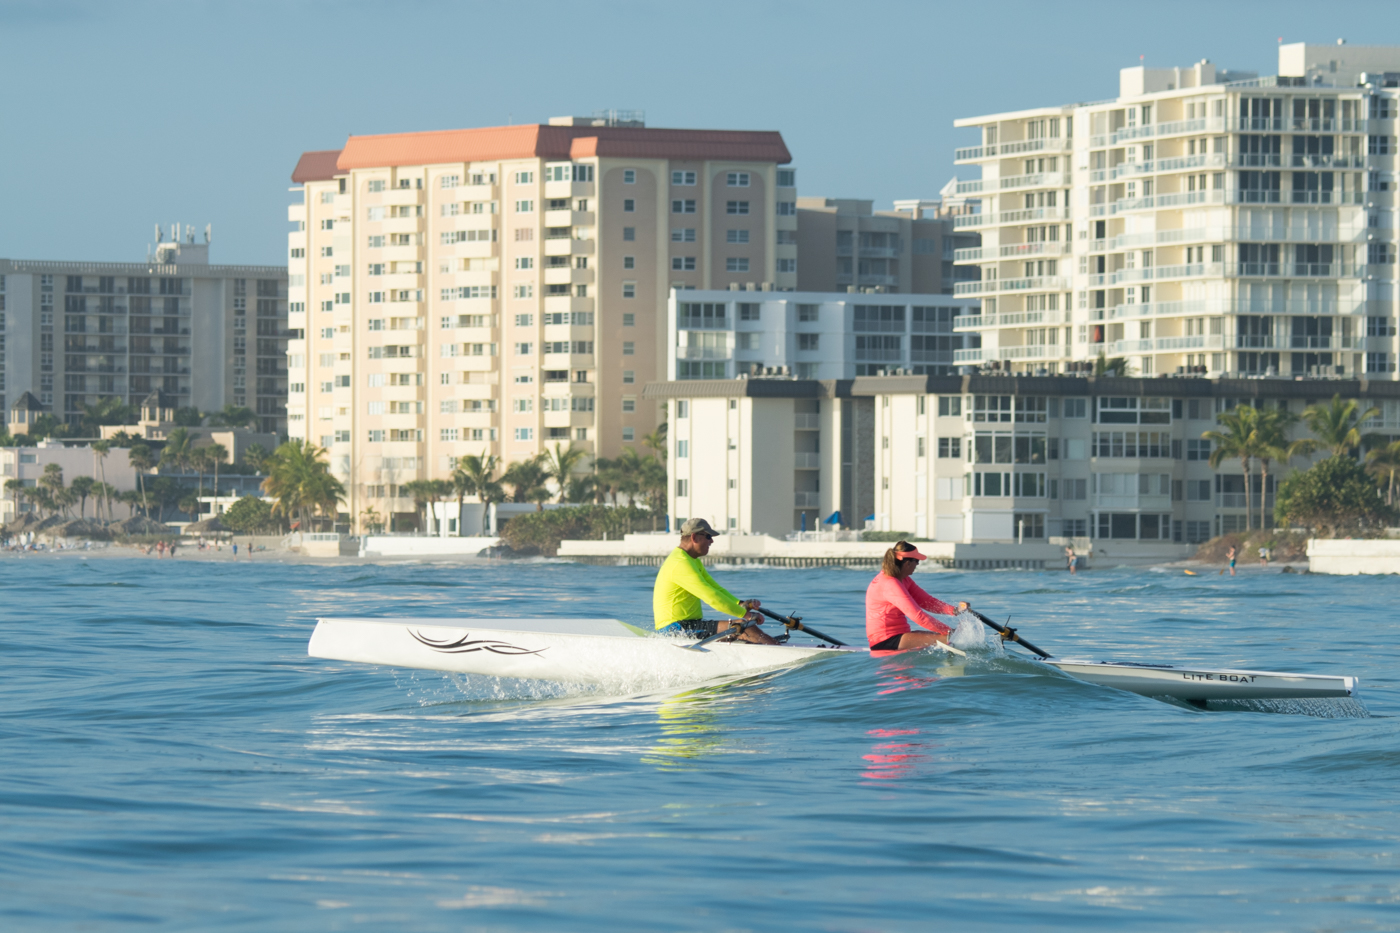 rowing_double-3.jpg